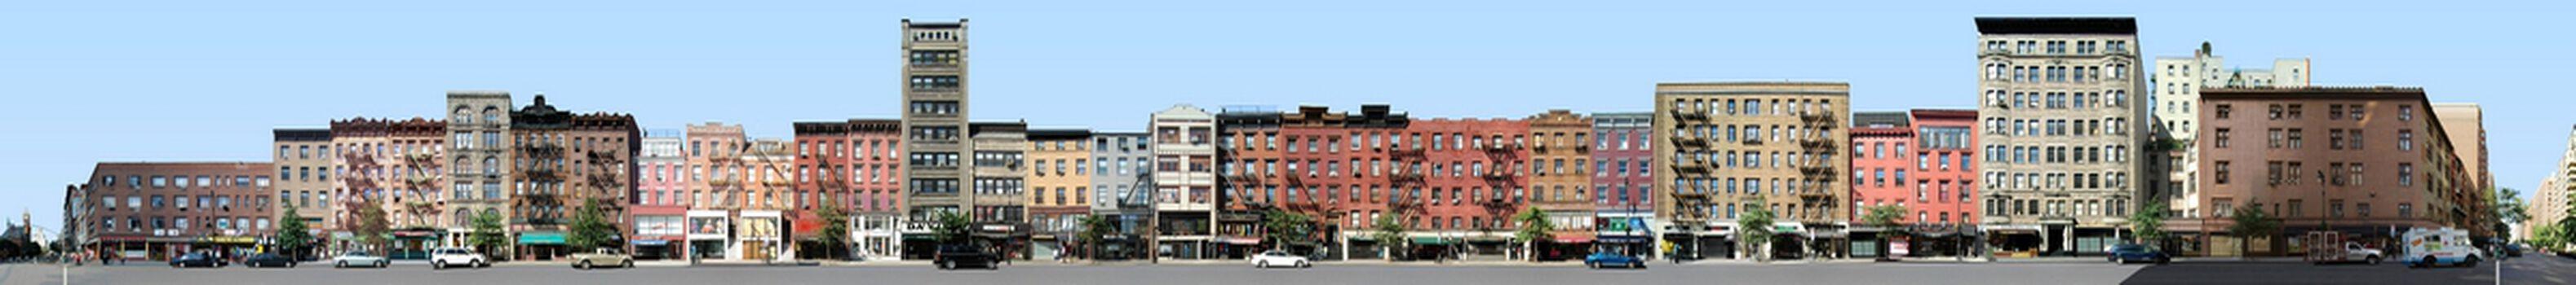 Photo 8Th Street, Greenwich Village - Cédric Mainguy